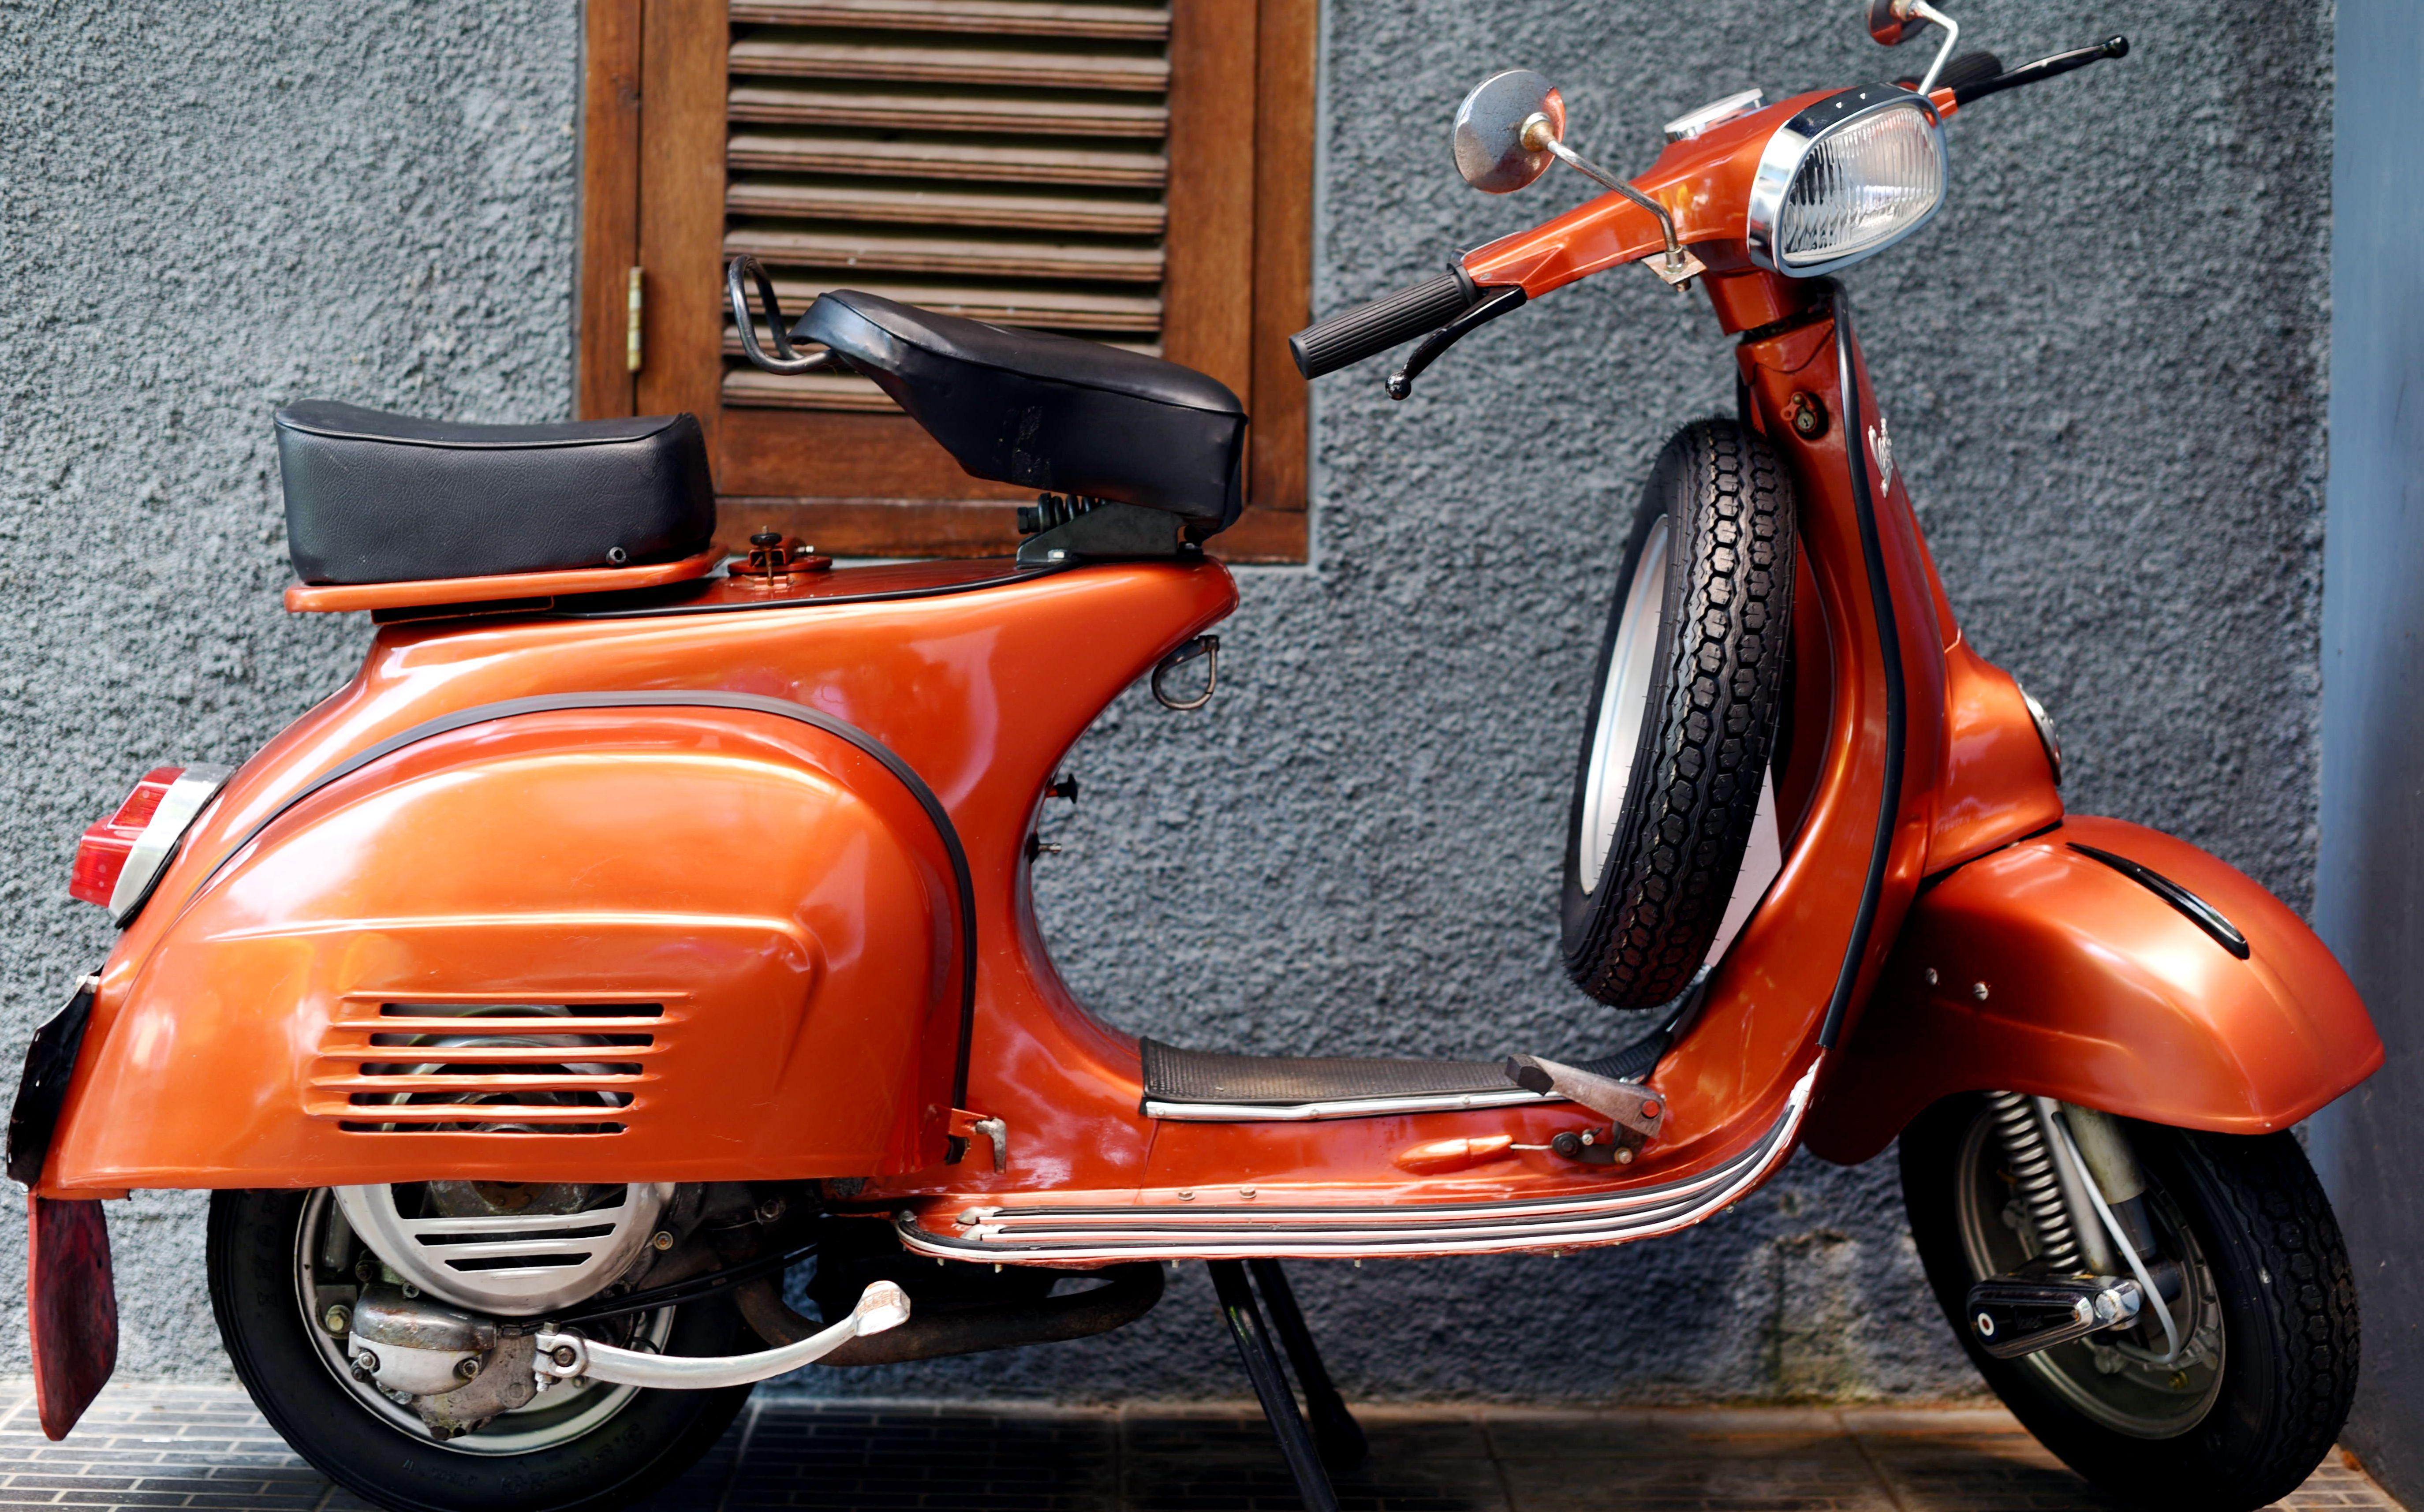 10 1978 Copper Super 150 Worldwide Vintage Vehicles